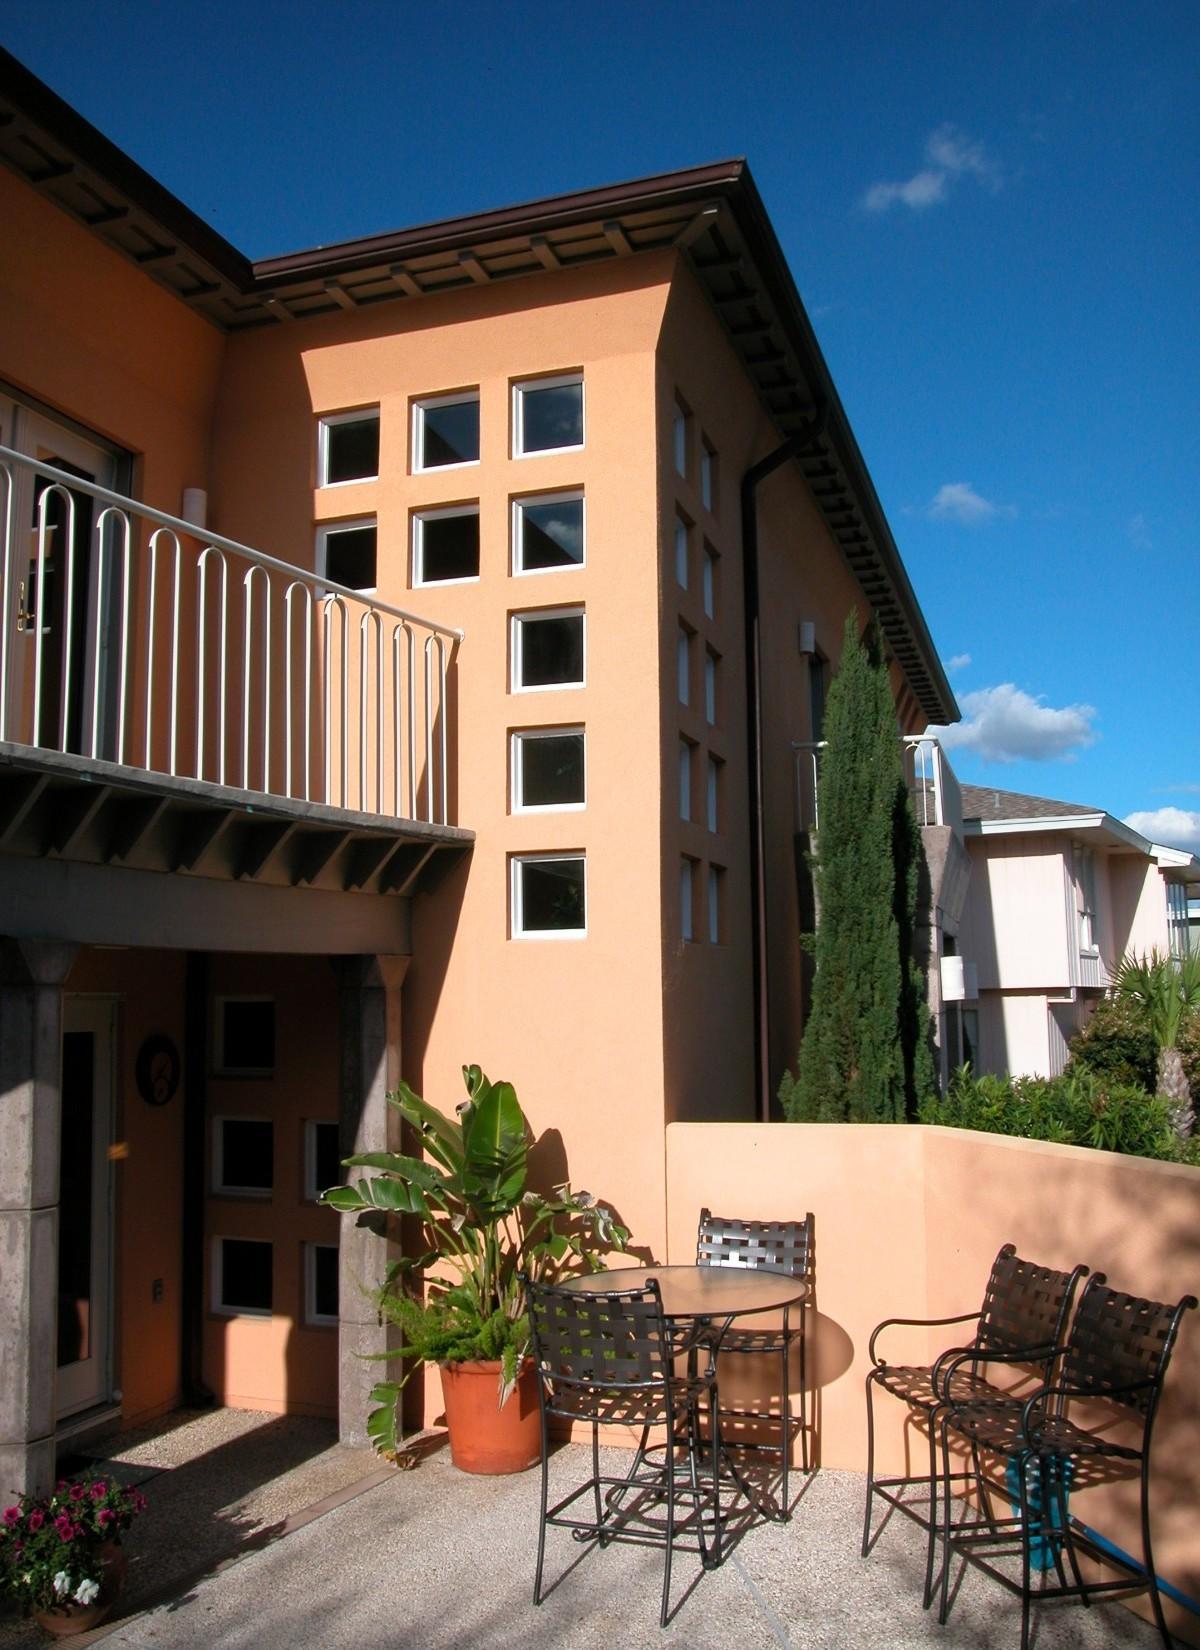 sullivan house deck patio.jpg